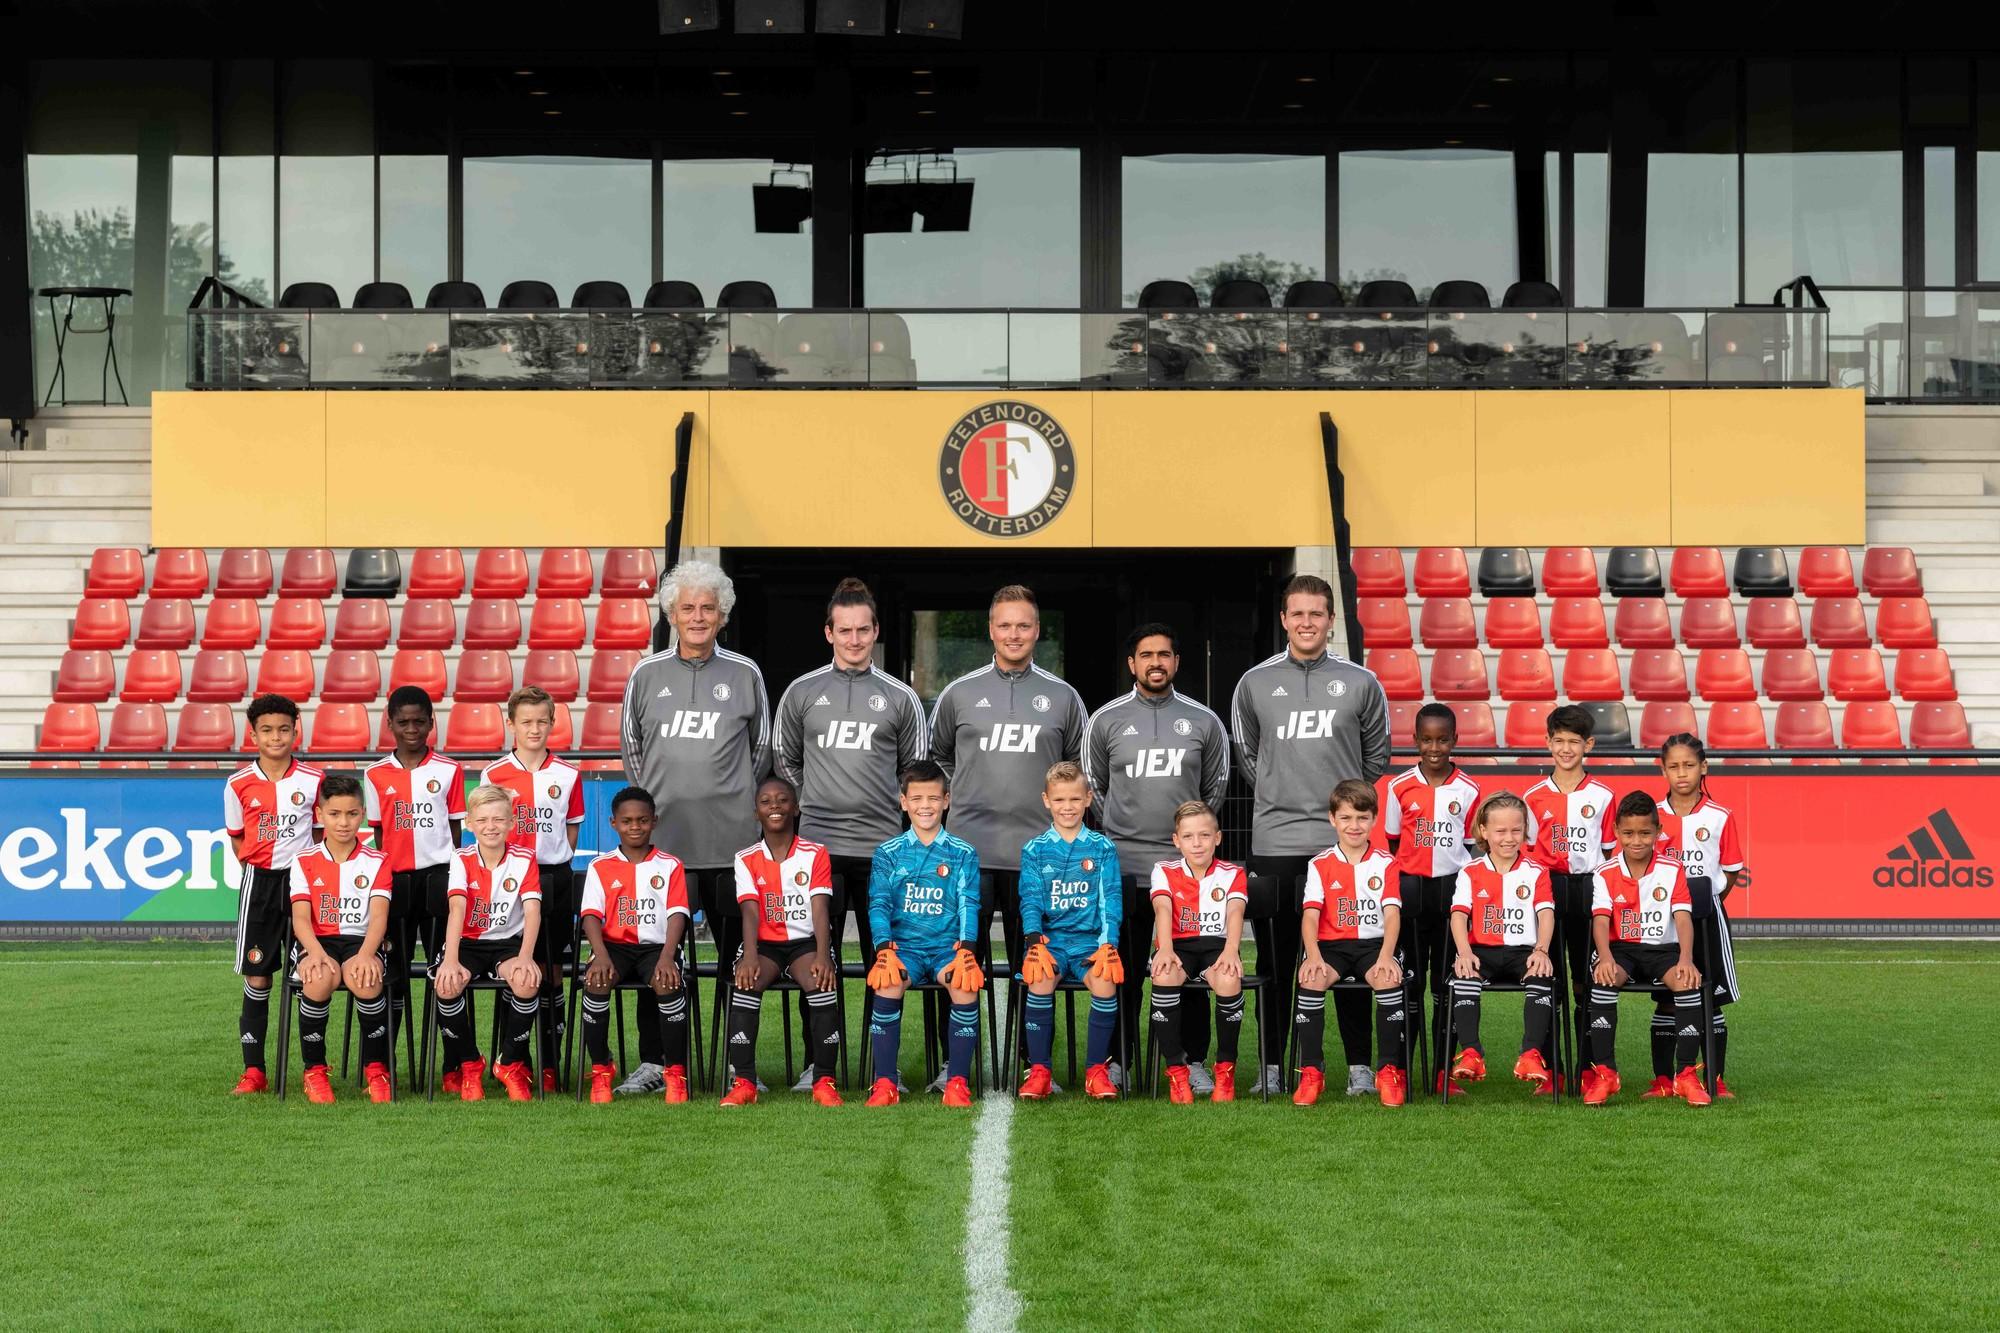 Feyenoord O10 20212022